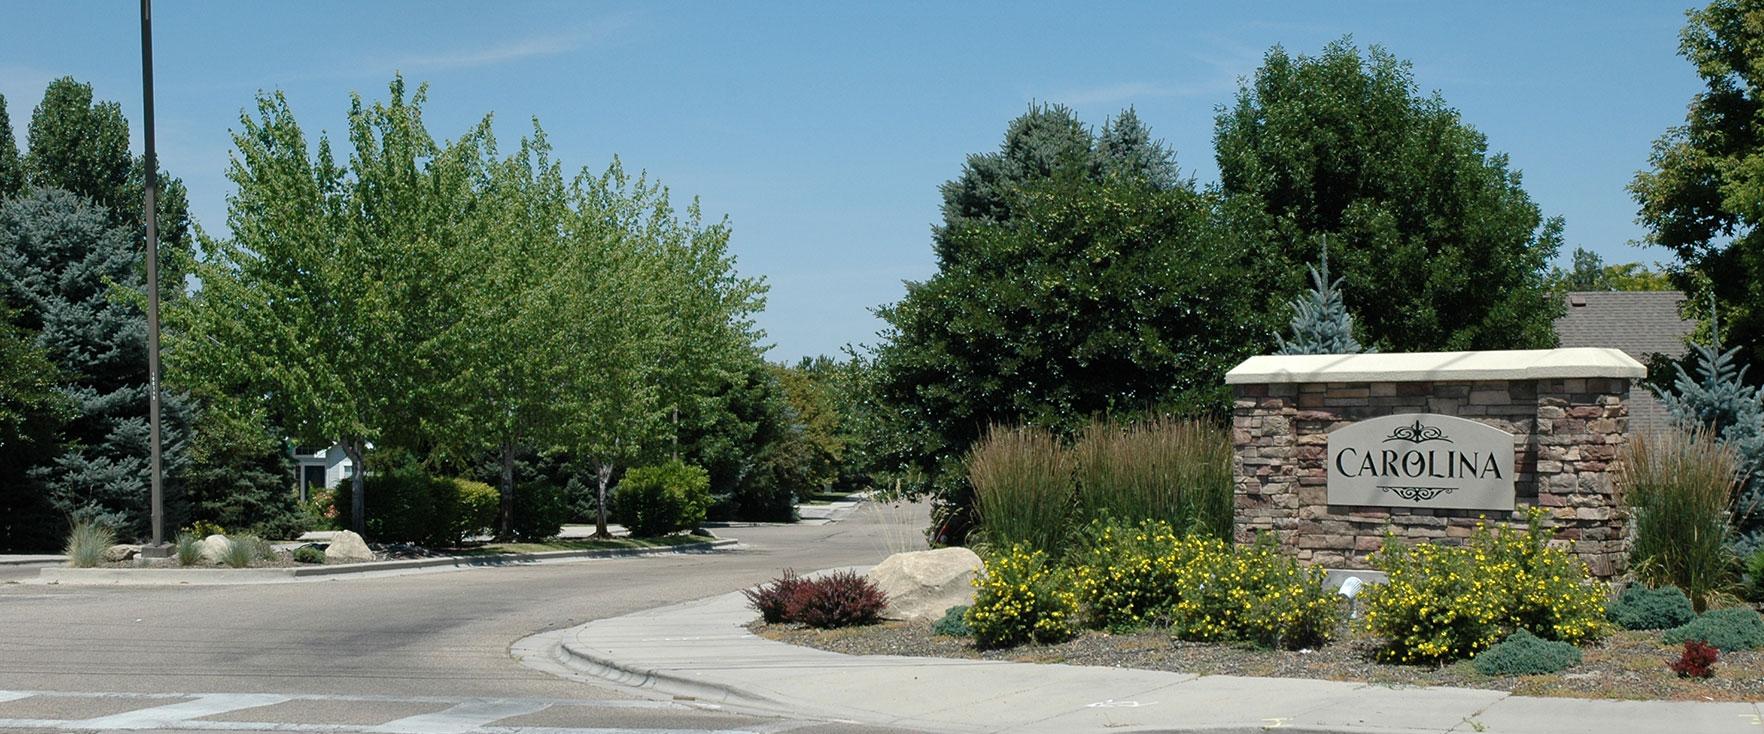 Carolina Subdivision Boise, ID   Charleston Place Boise, ID   HOA